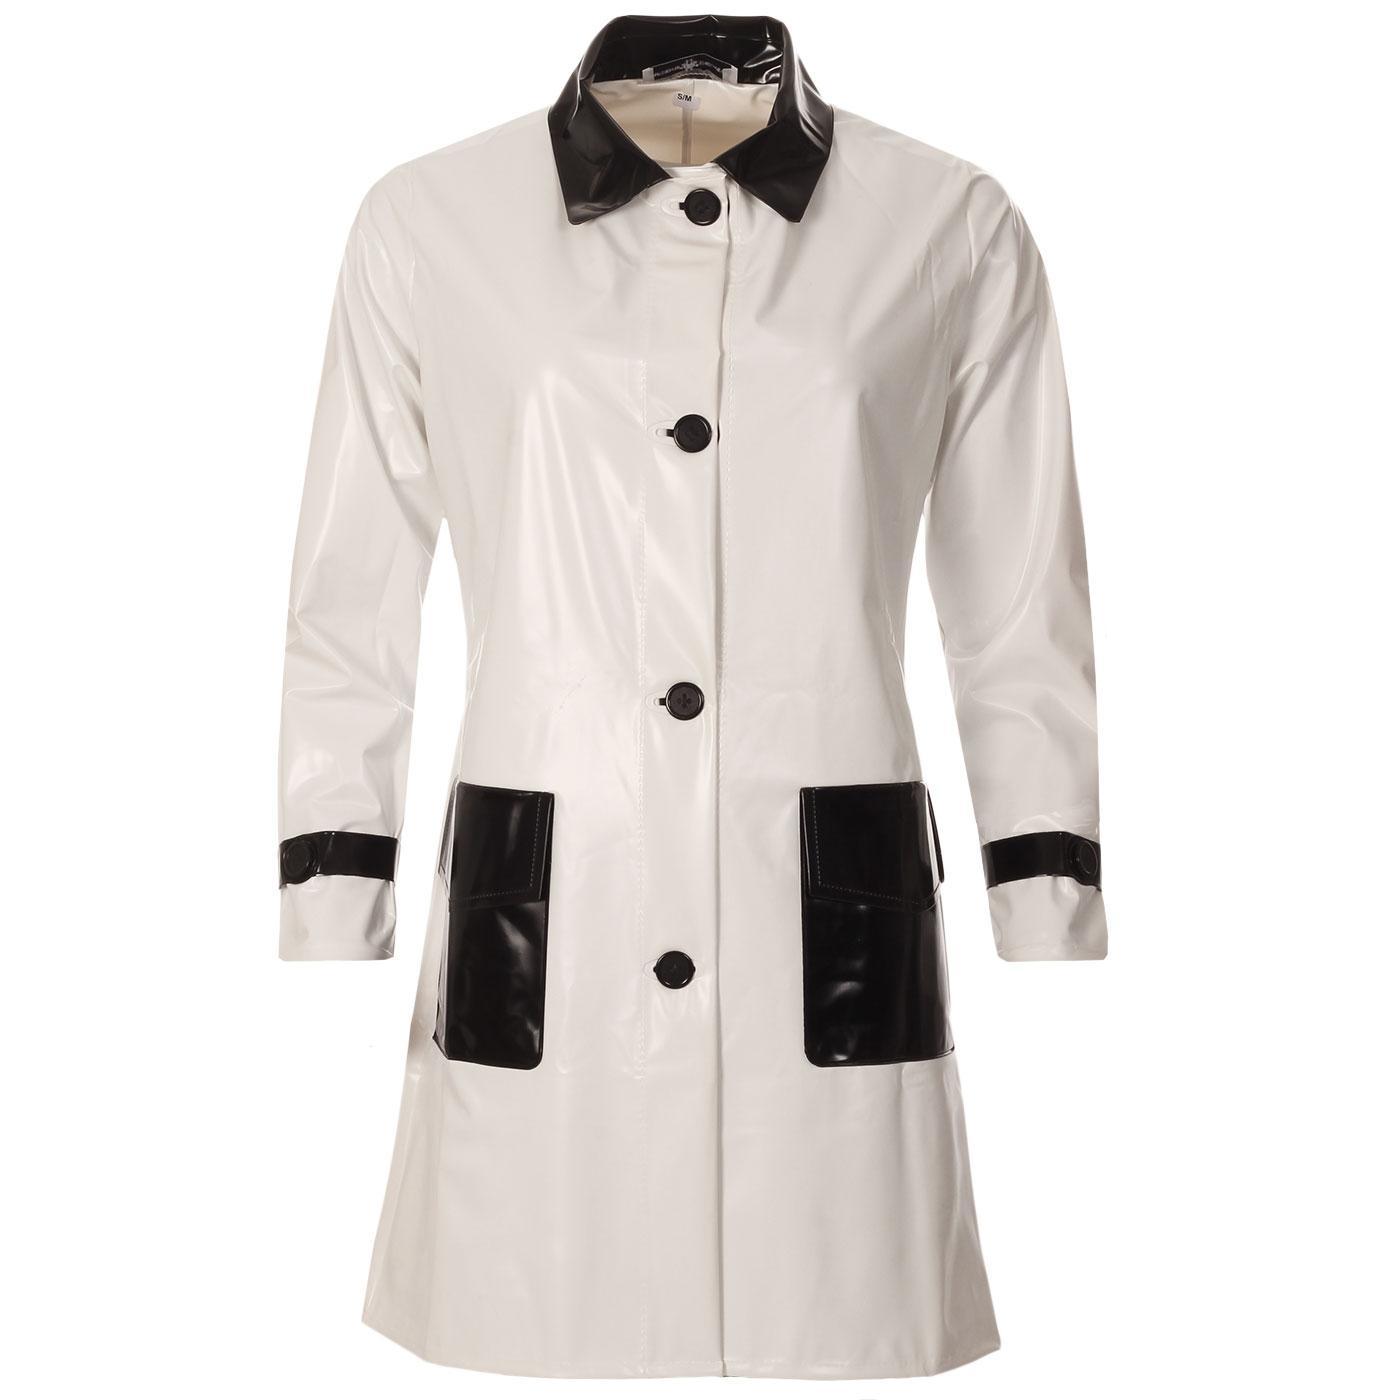 Madcap England Robin 1960s Mod Two Tone PVC Raincoat in White